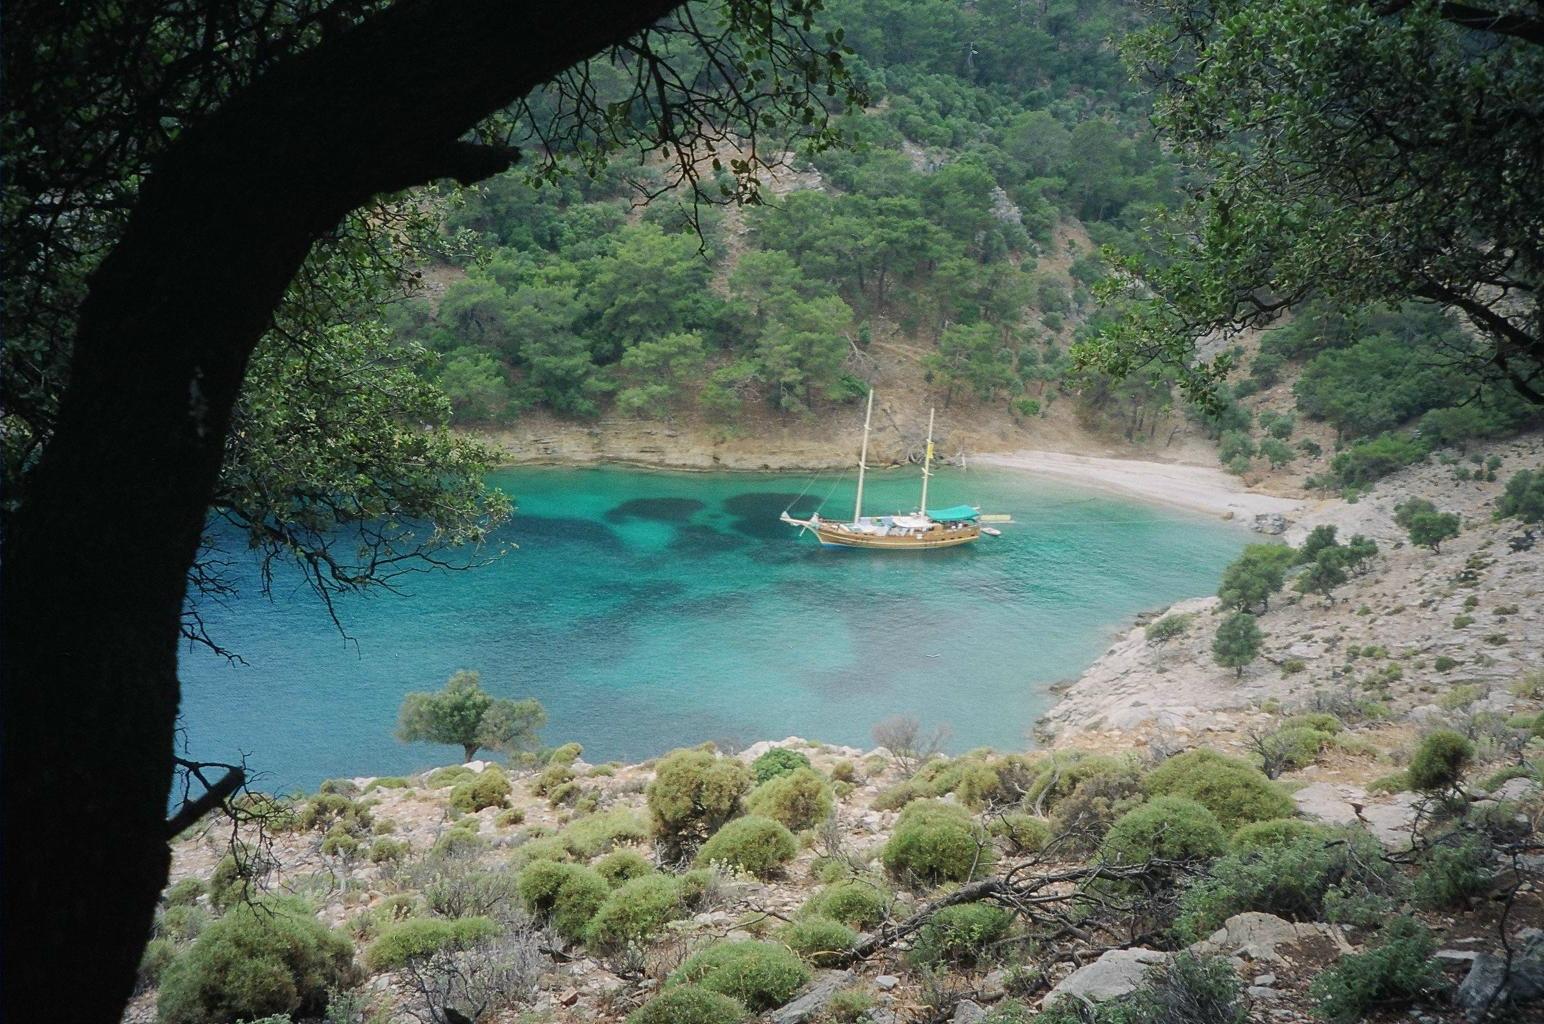 Explore Turkey's Turquoise Coast